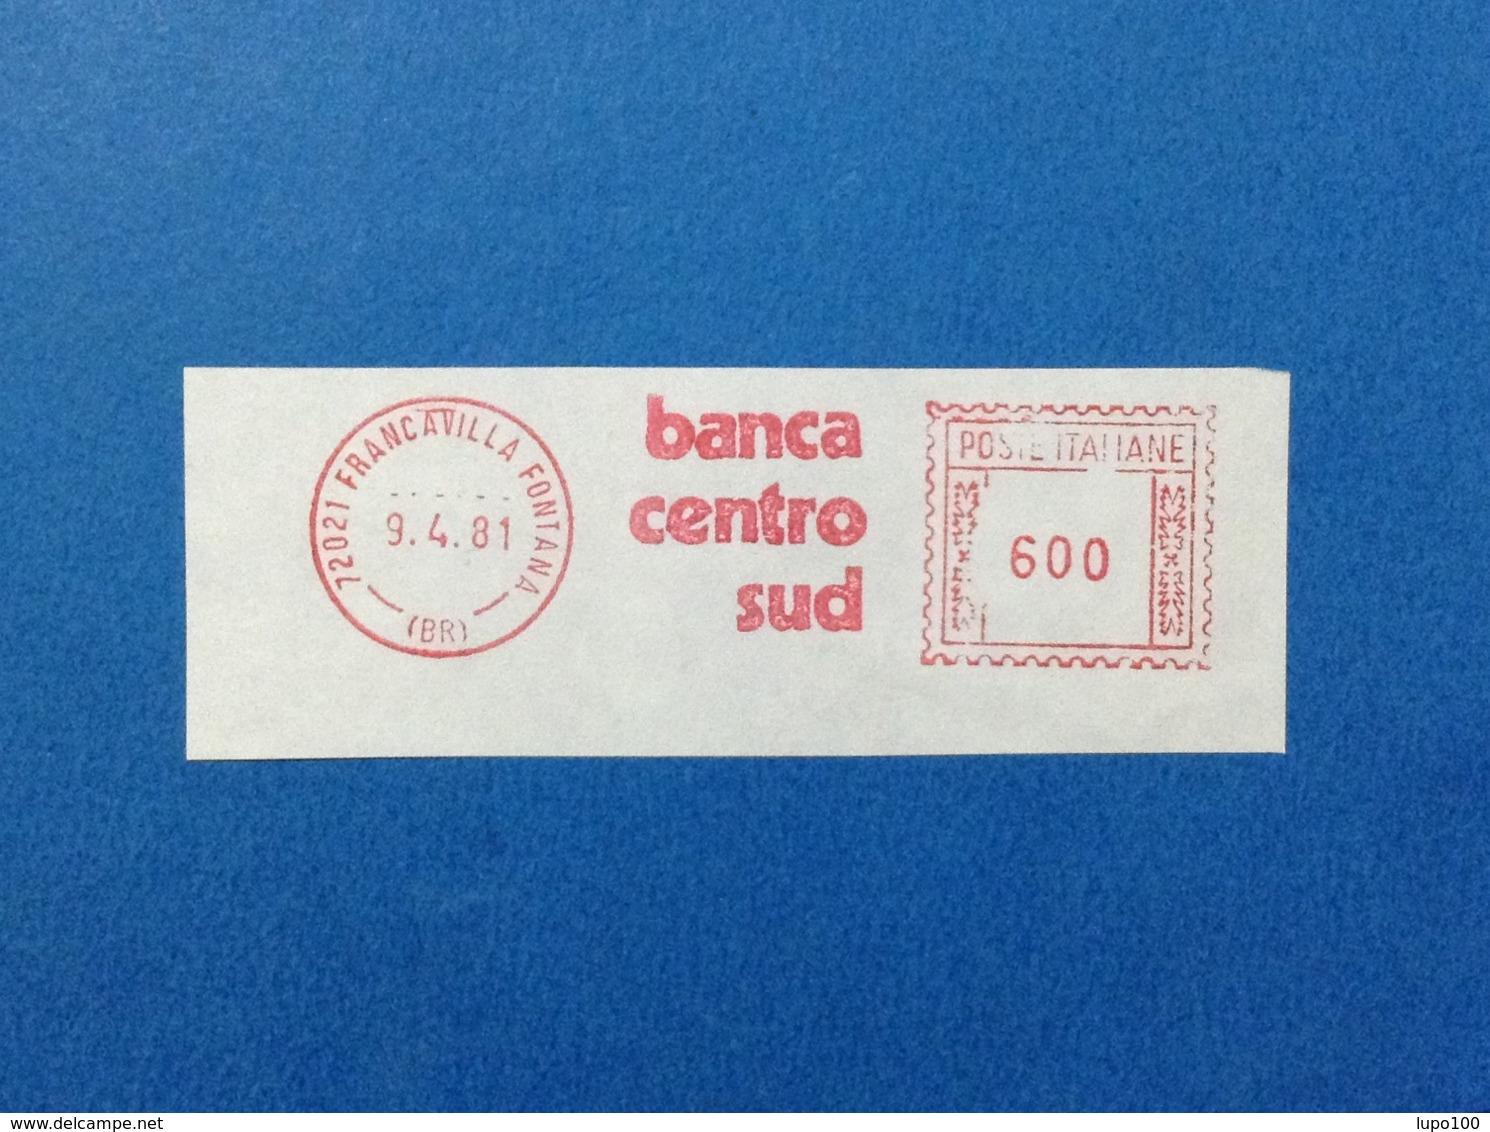 1981 AFFRANCATURA MECCANICA ROSSA EMA RED BANCA CENTRO SUD FRANCAVILLA FONTANA BRINDISI - Affrancature Meccaniche Rosse (EMA)